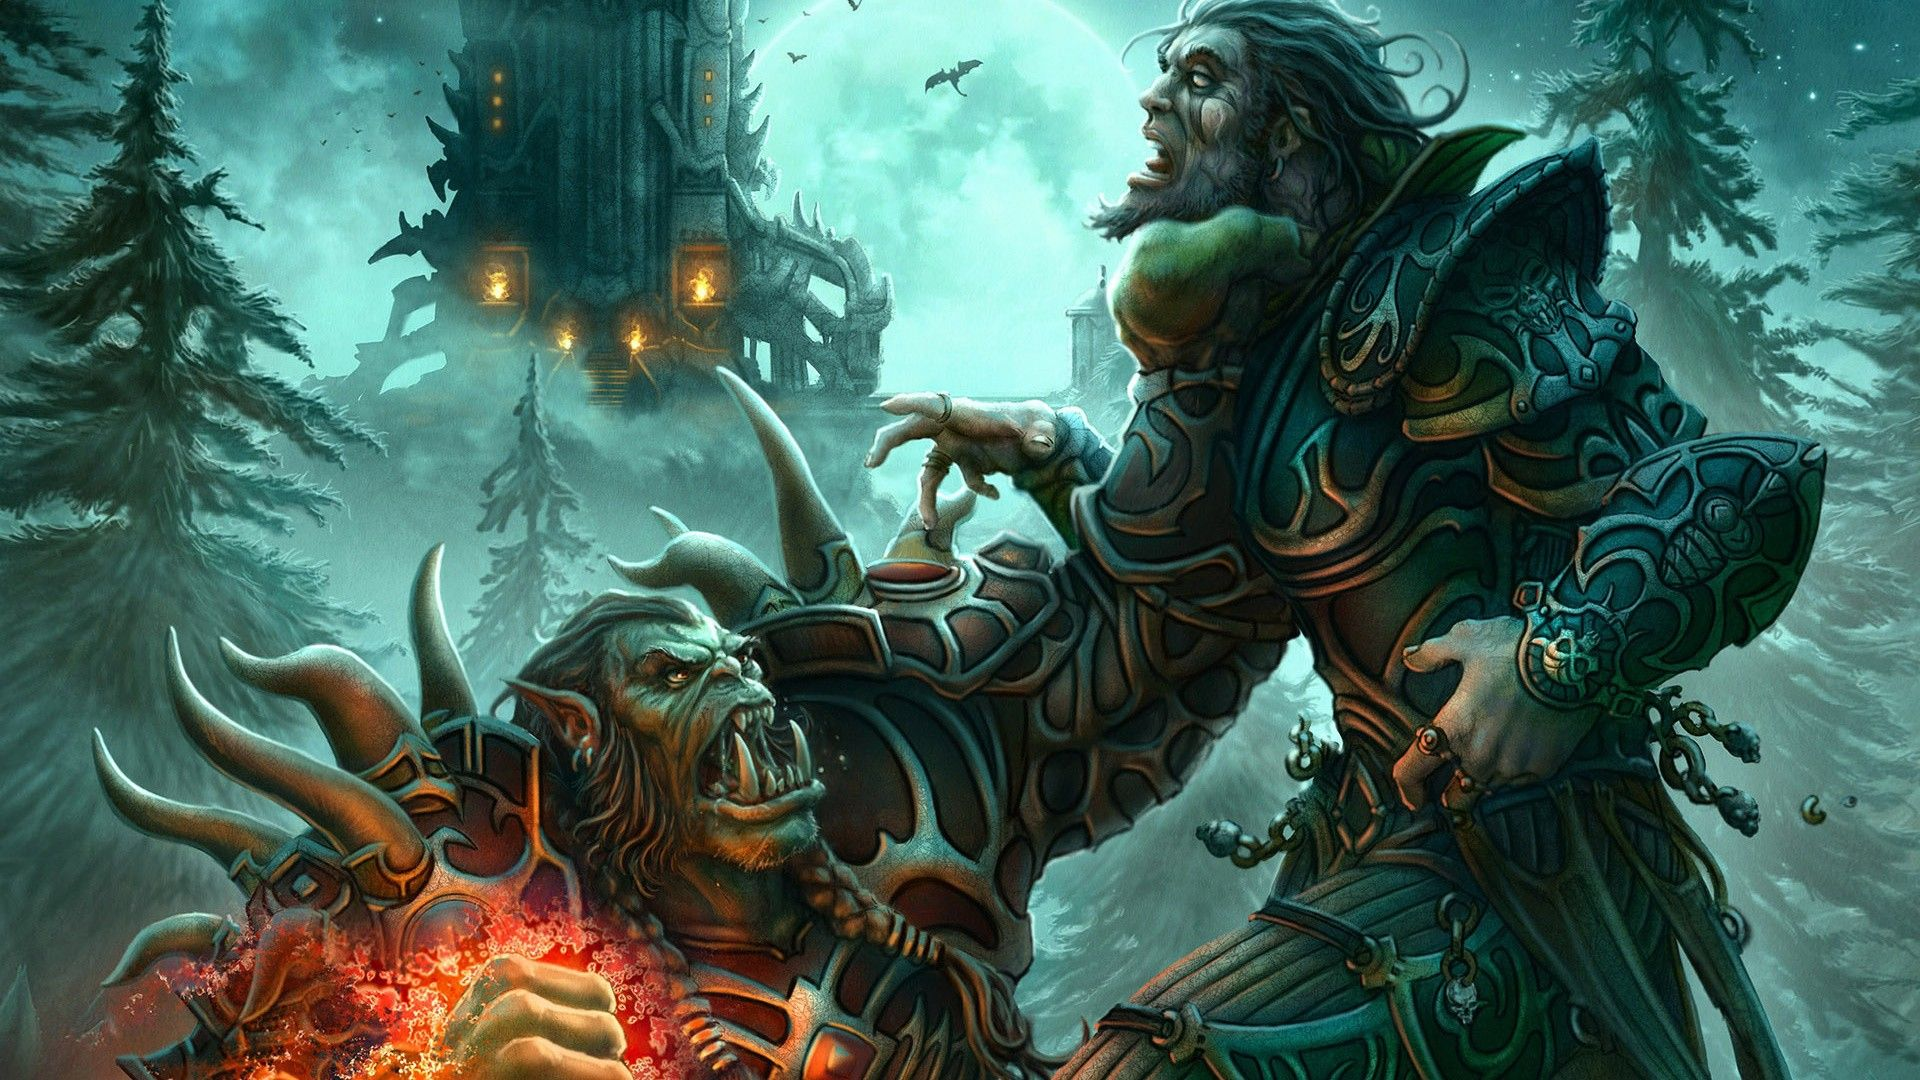 Luxury Undead Rogue Wallpaper World Of Warcraft Wallpaper World Of Warcraft Orc World Of Warcraft